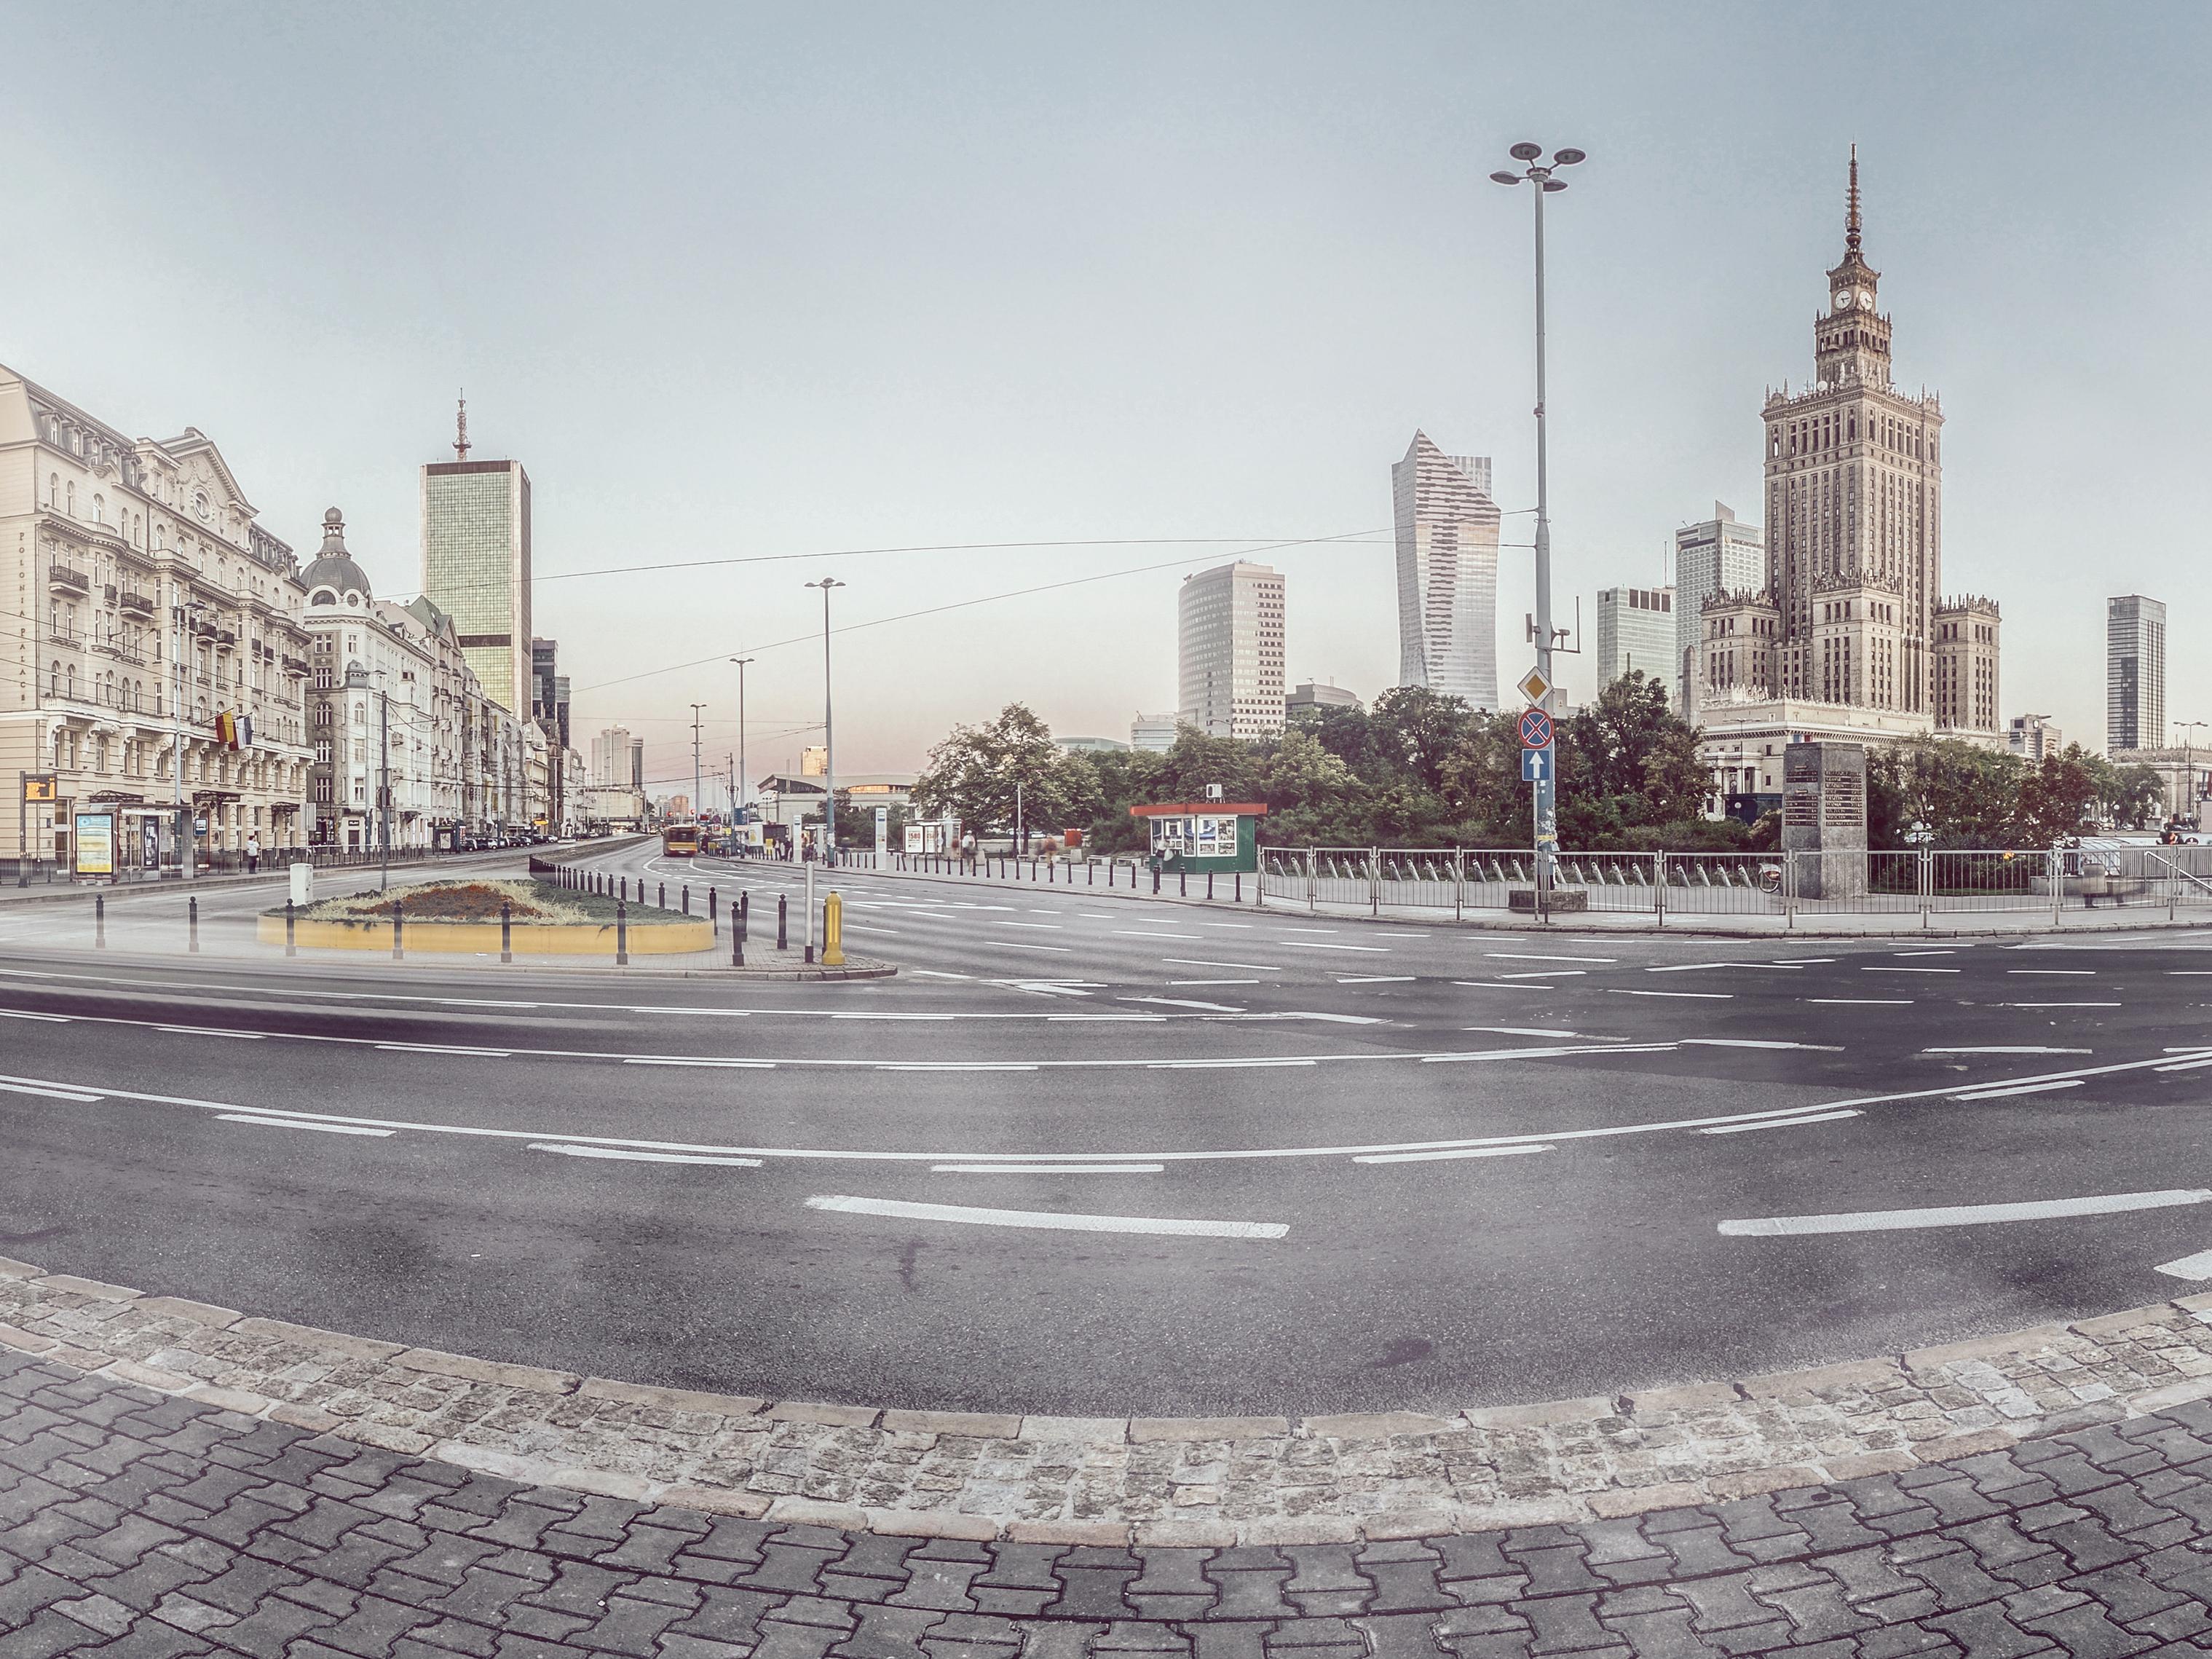 Nowa perspektywa miastaw kampanii Nike Nike Nowa Perspektywa Miasta Rotunda